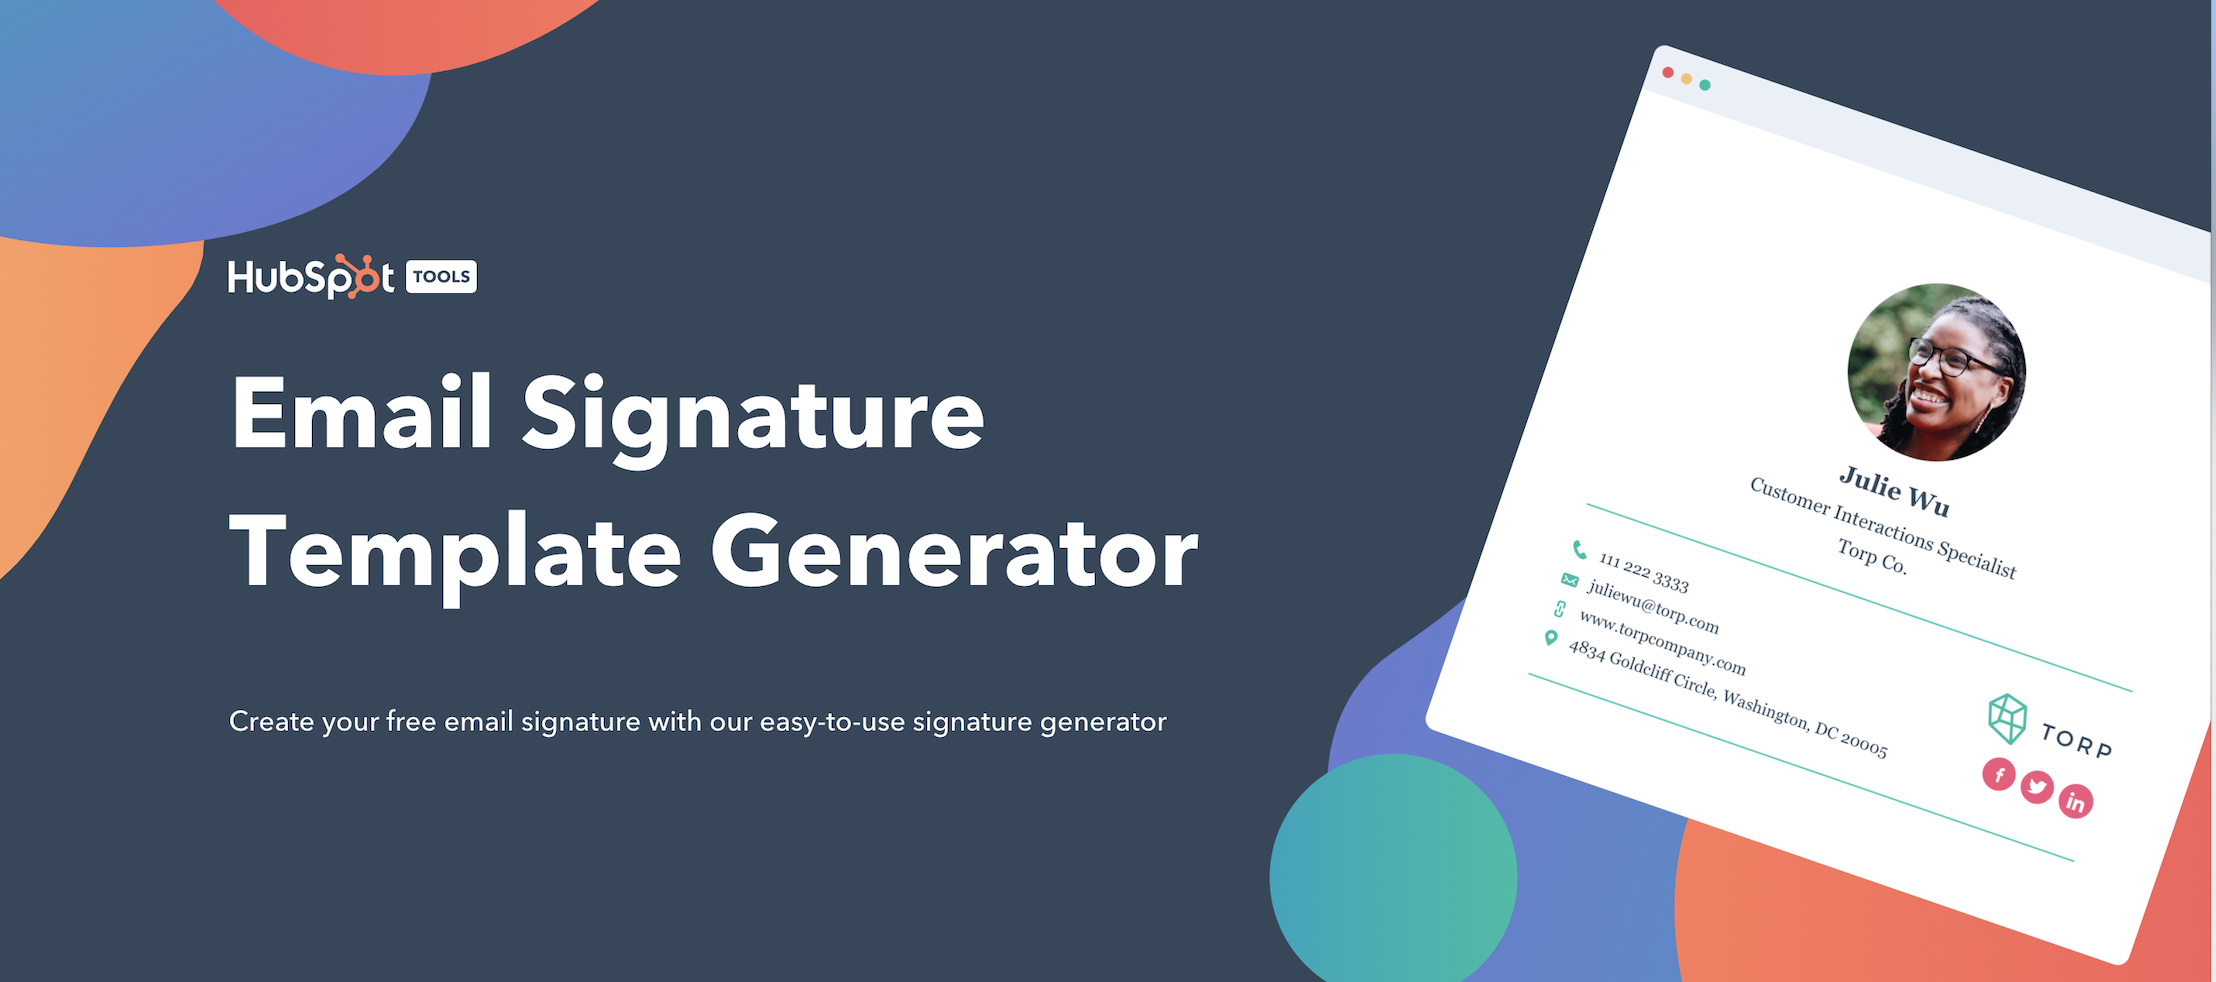 Hubspot Email Template Generator